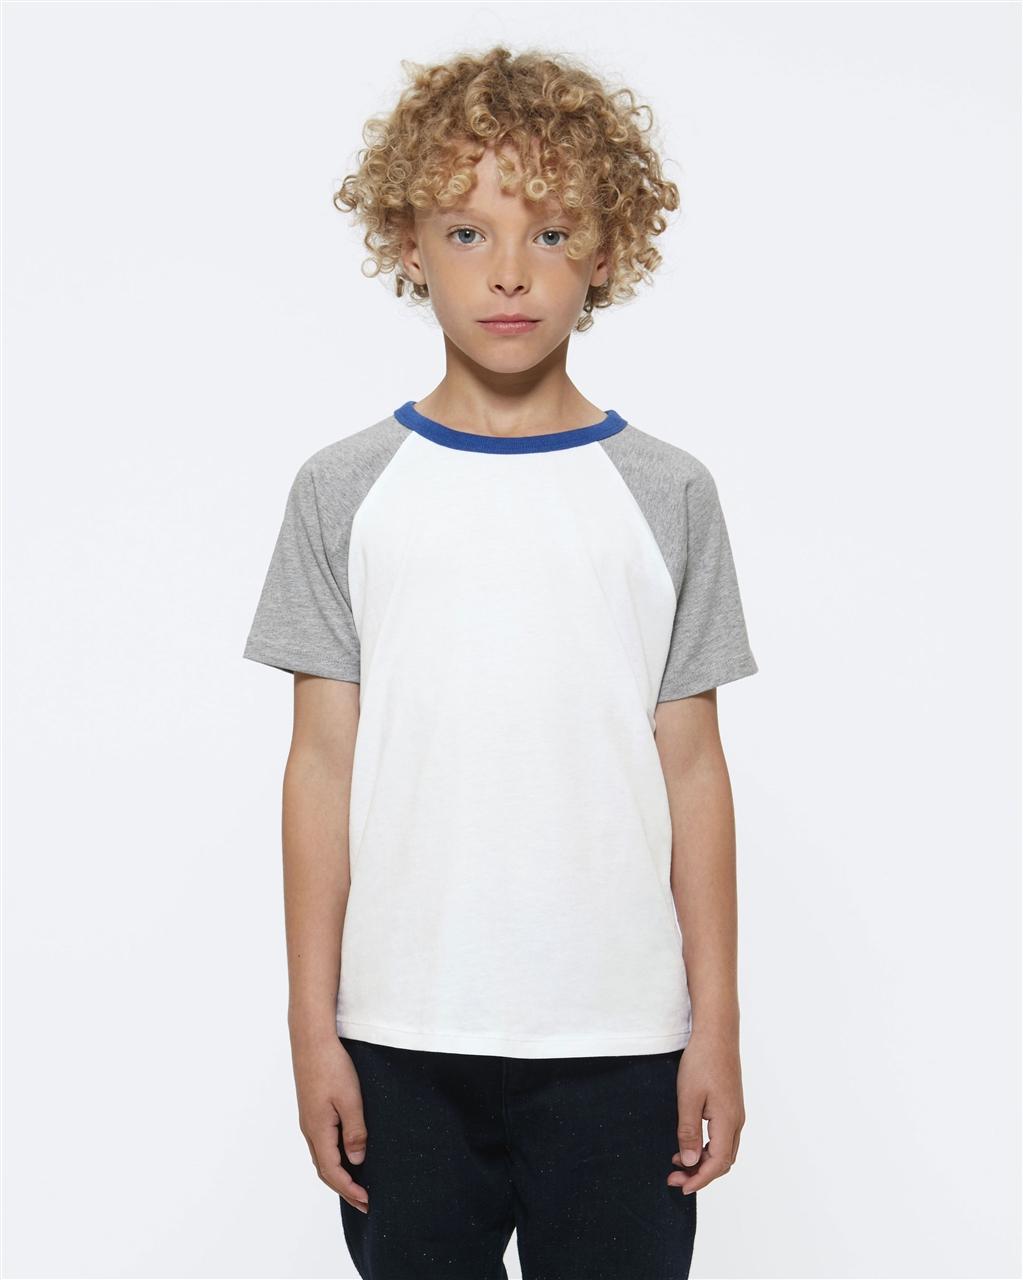 Raglan T-Shirt White Grey Blue